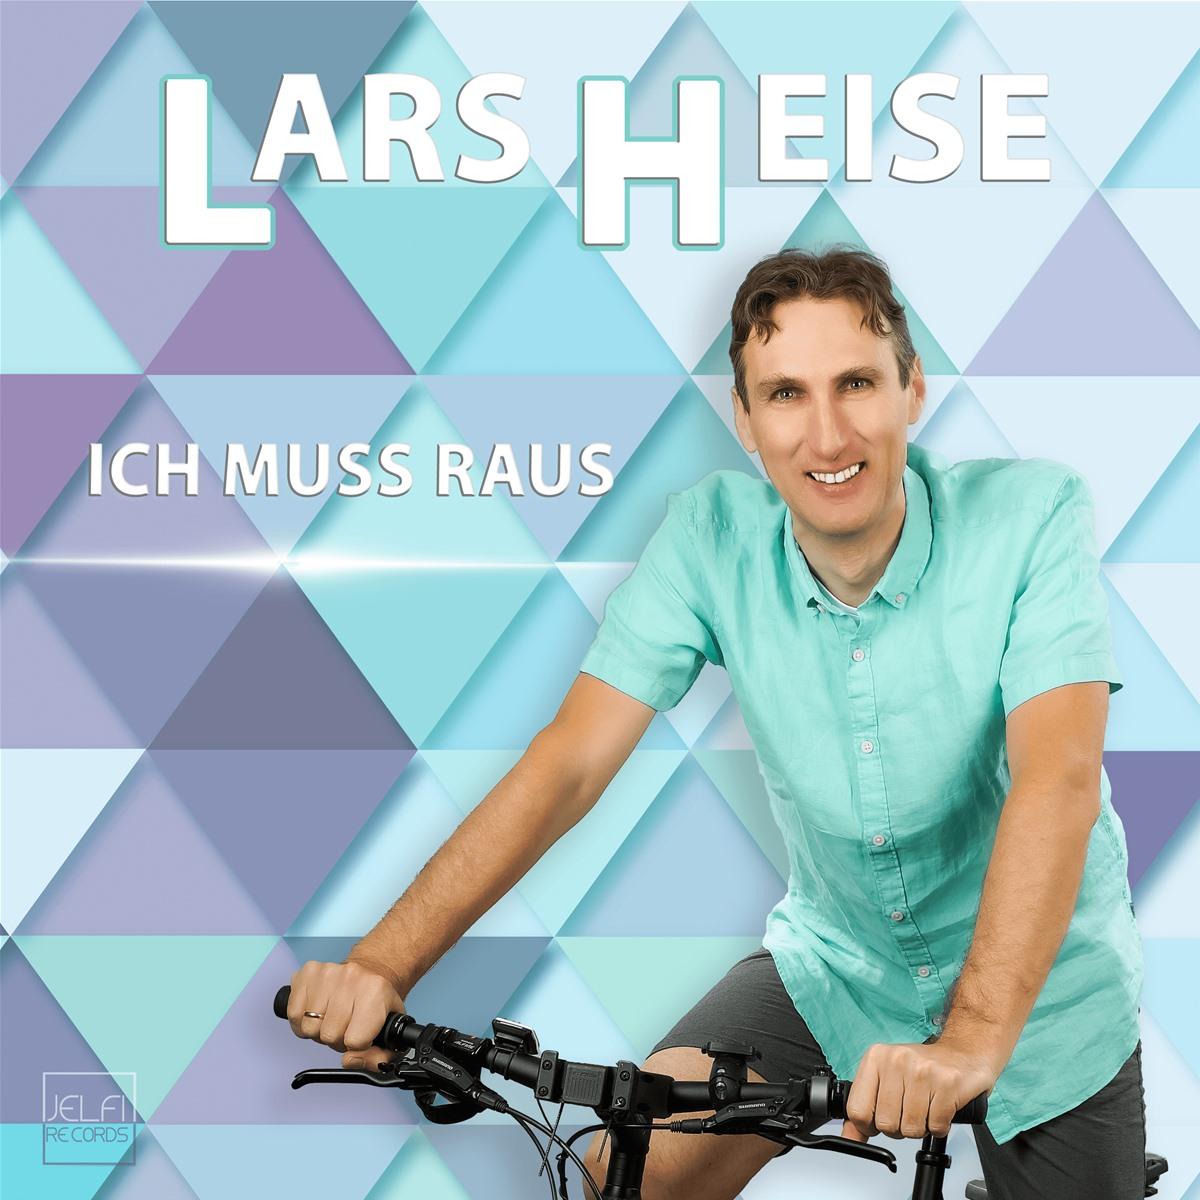 LARS HEISE * Ich muss raus (Single-Debüt)